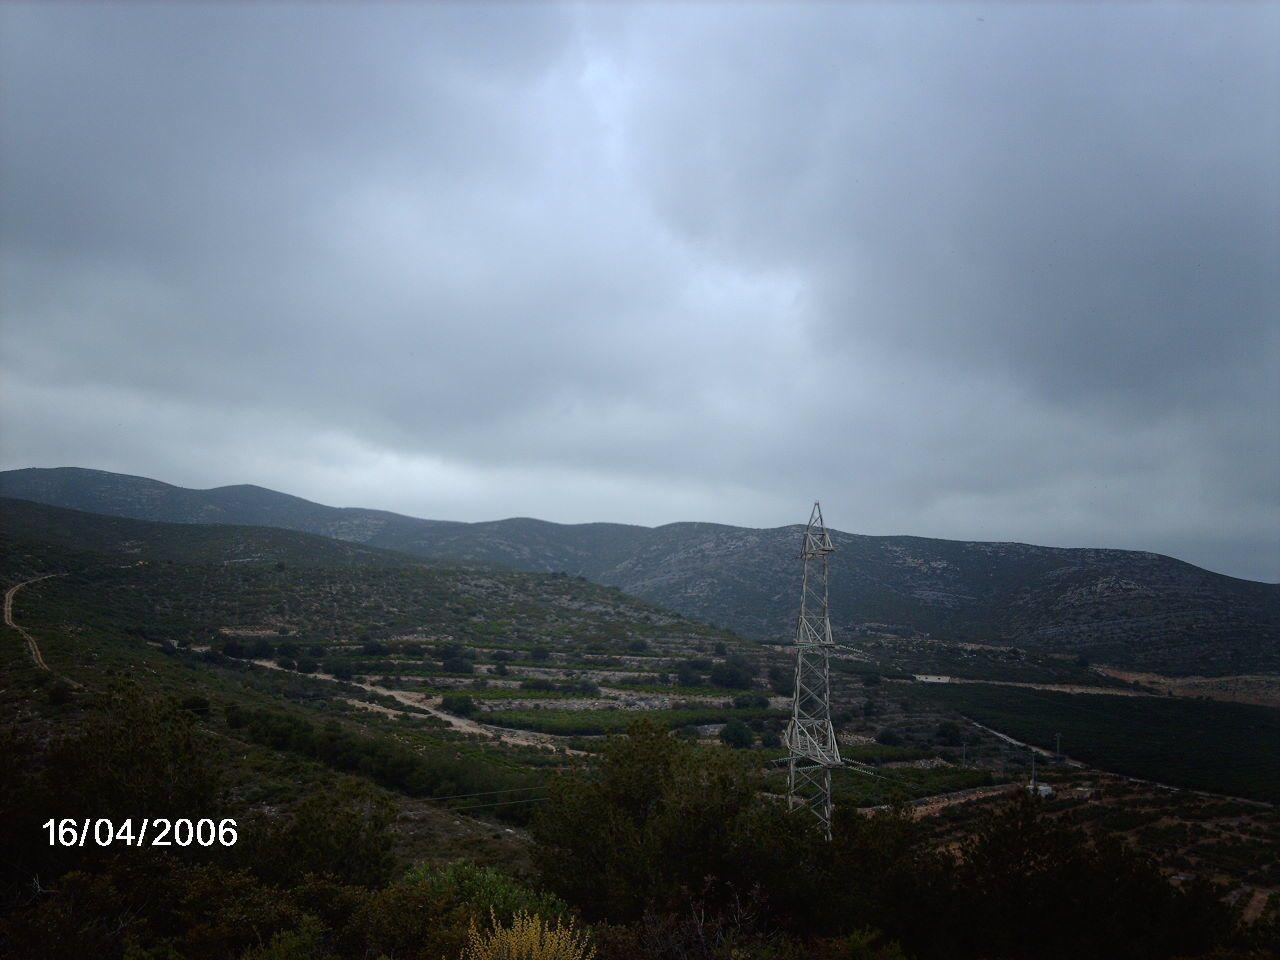 imag0295